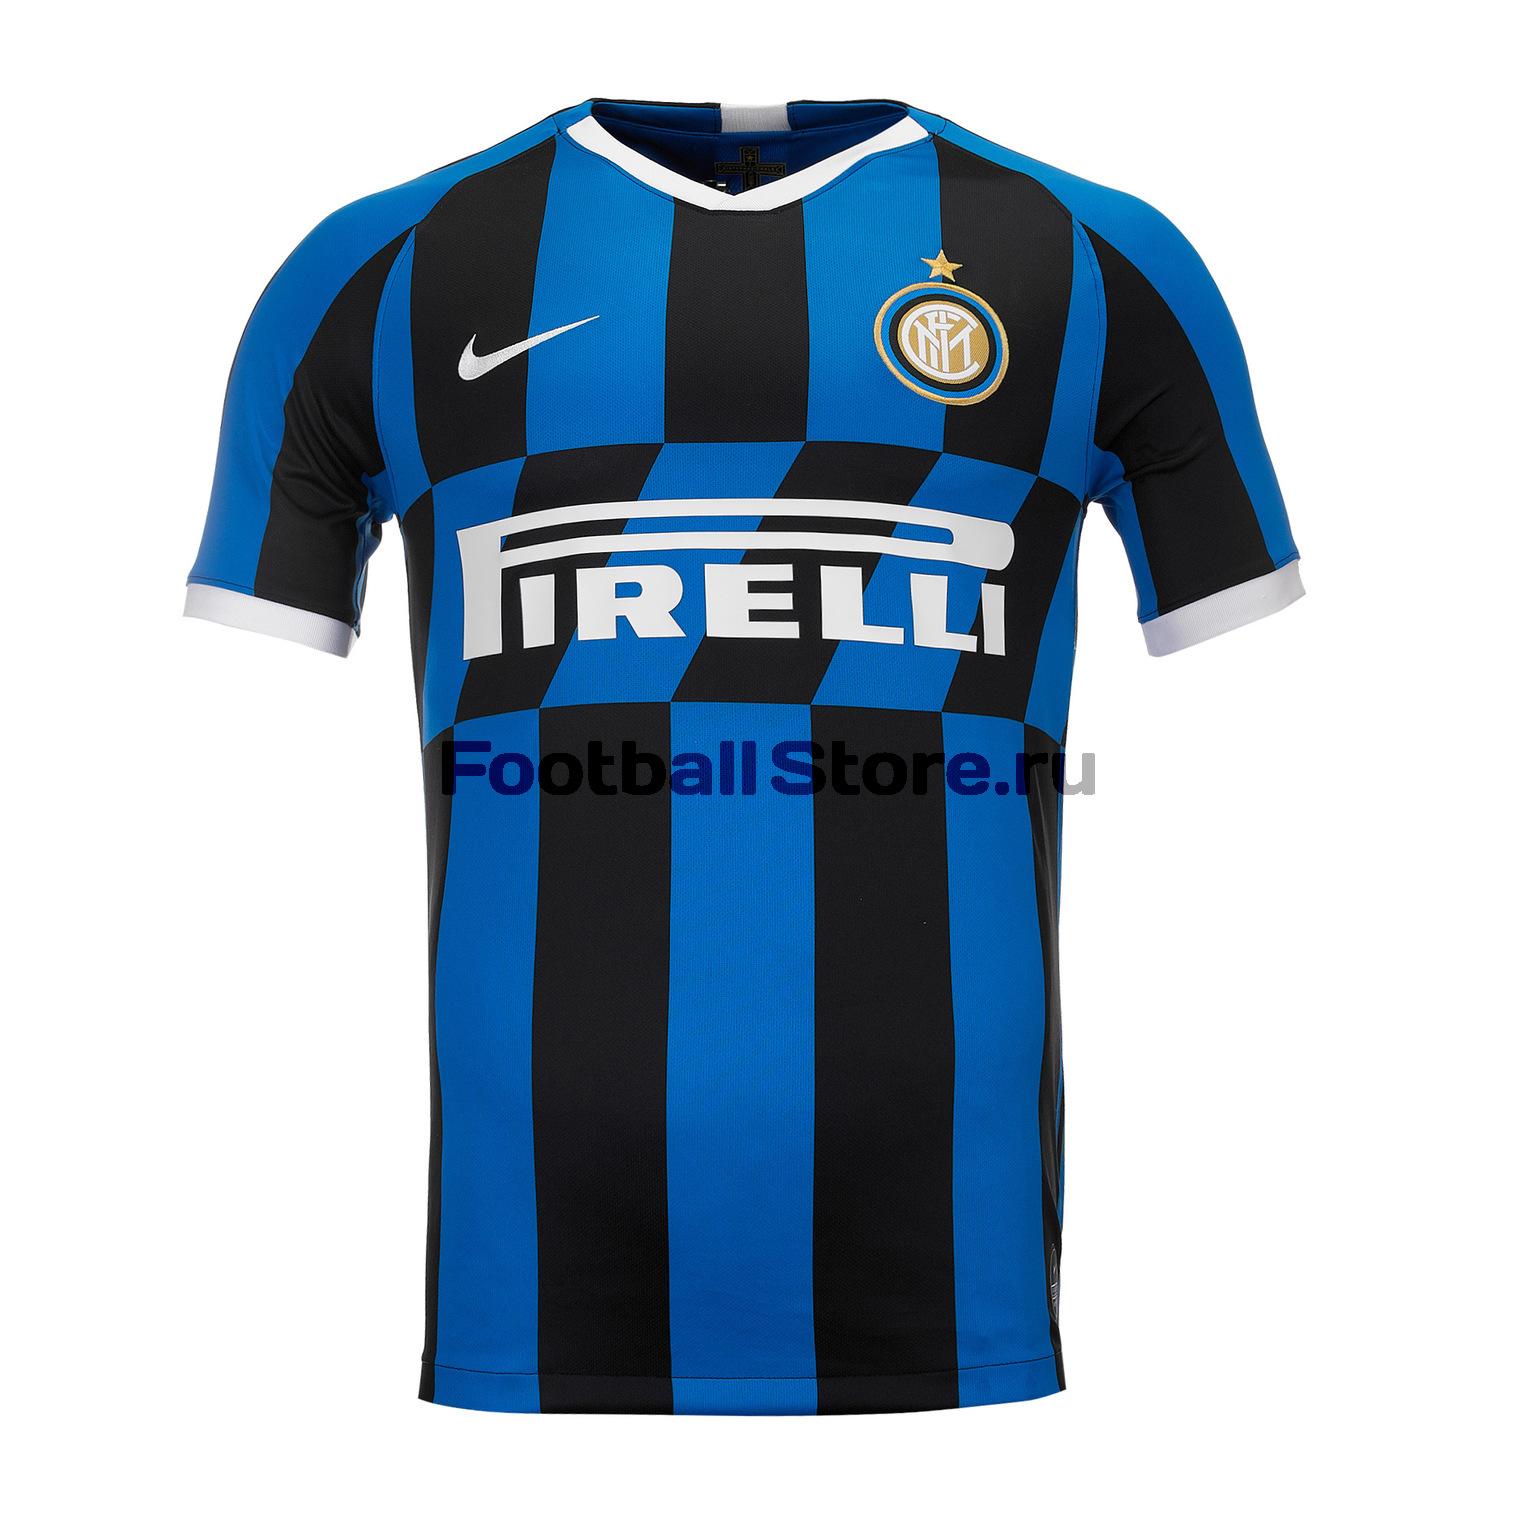 Футболка домашняя Nike Inter 2019/20 оригинальная домашняя футболка nike дзюба 22 2018 19 nike